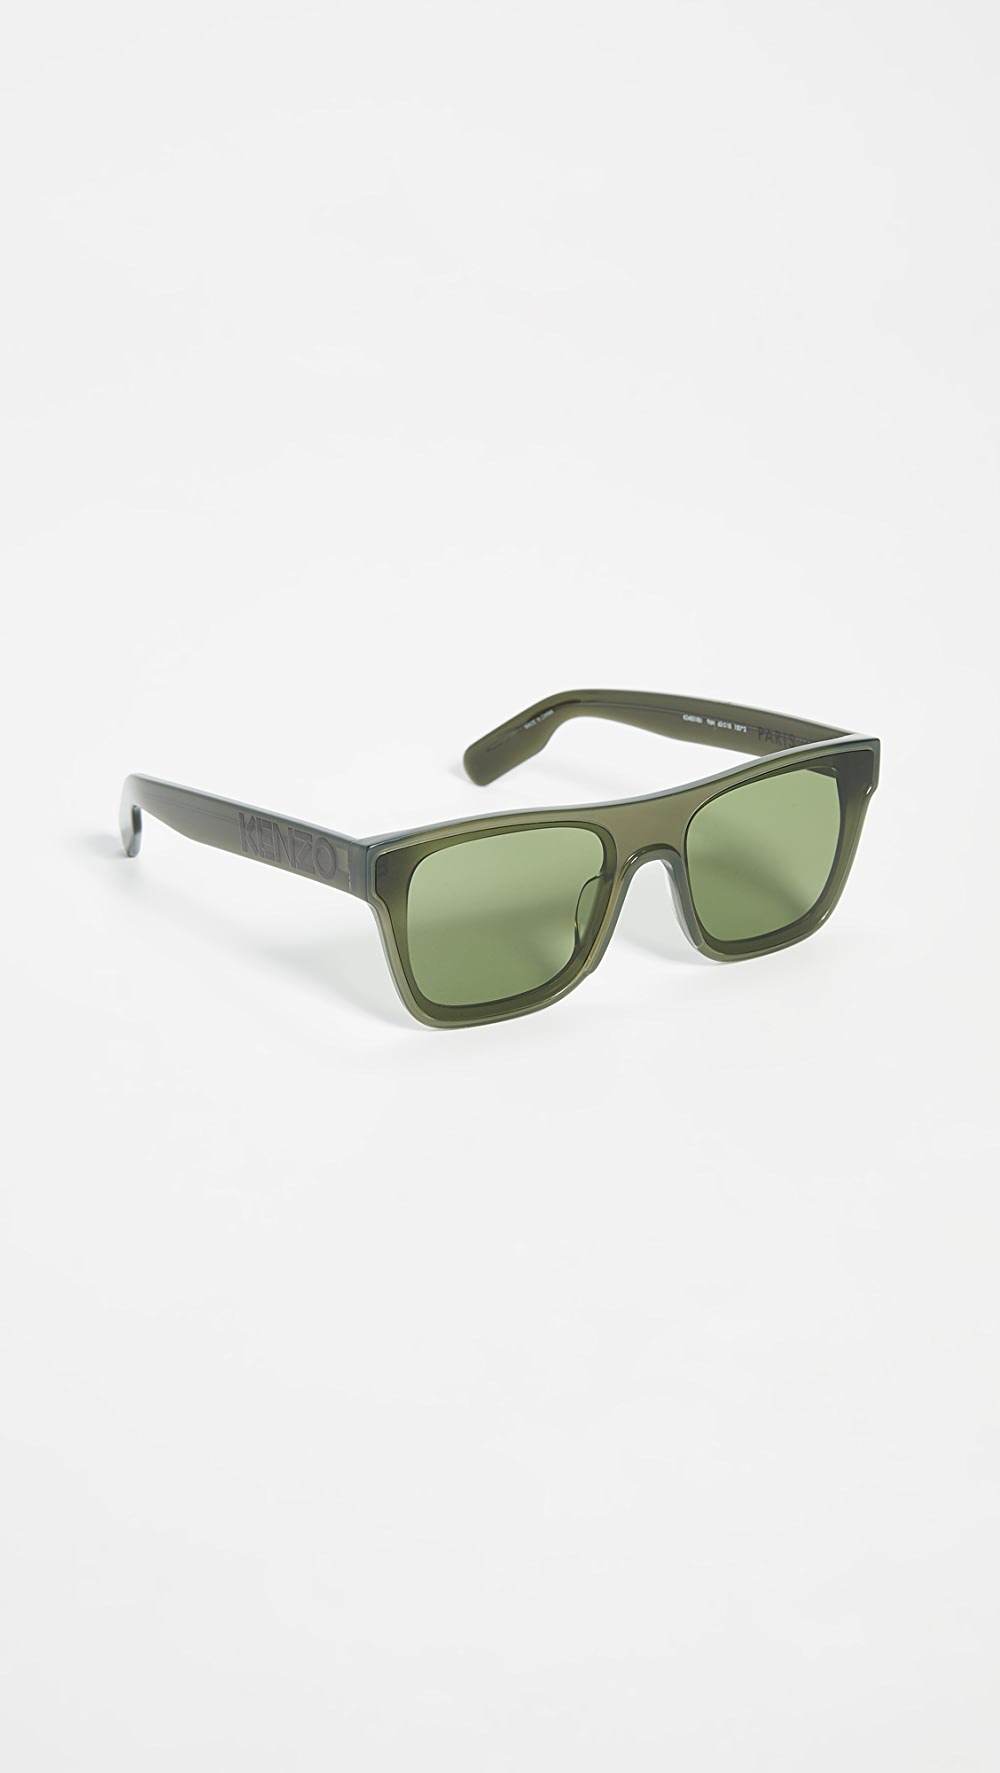 100% True Kenzo - Classic Flat Top Sunglasses Beautiful In Colour